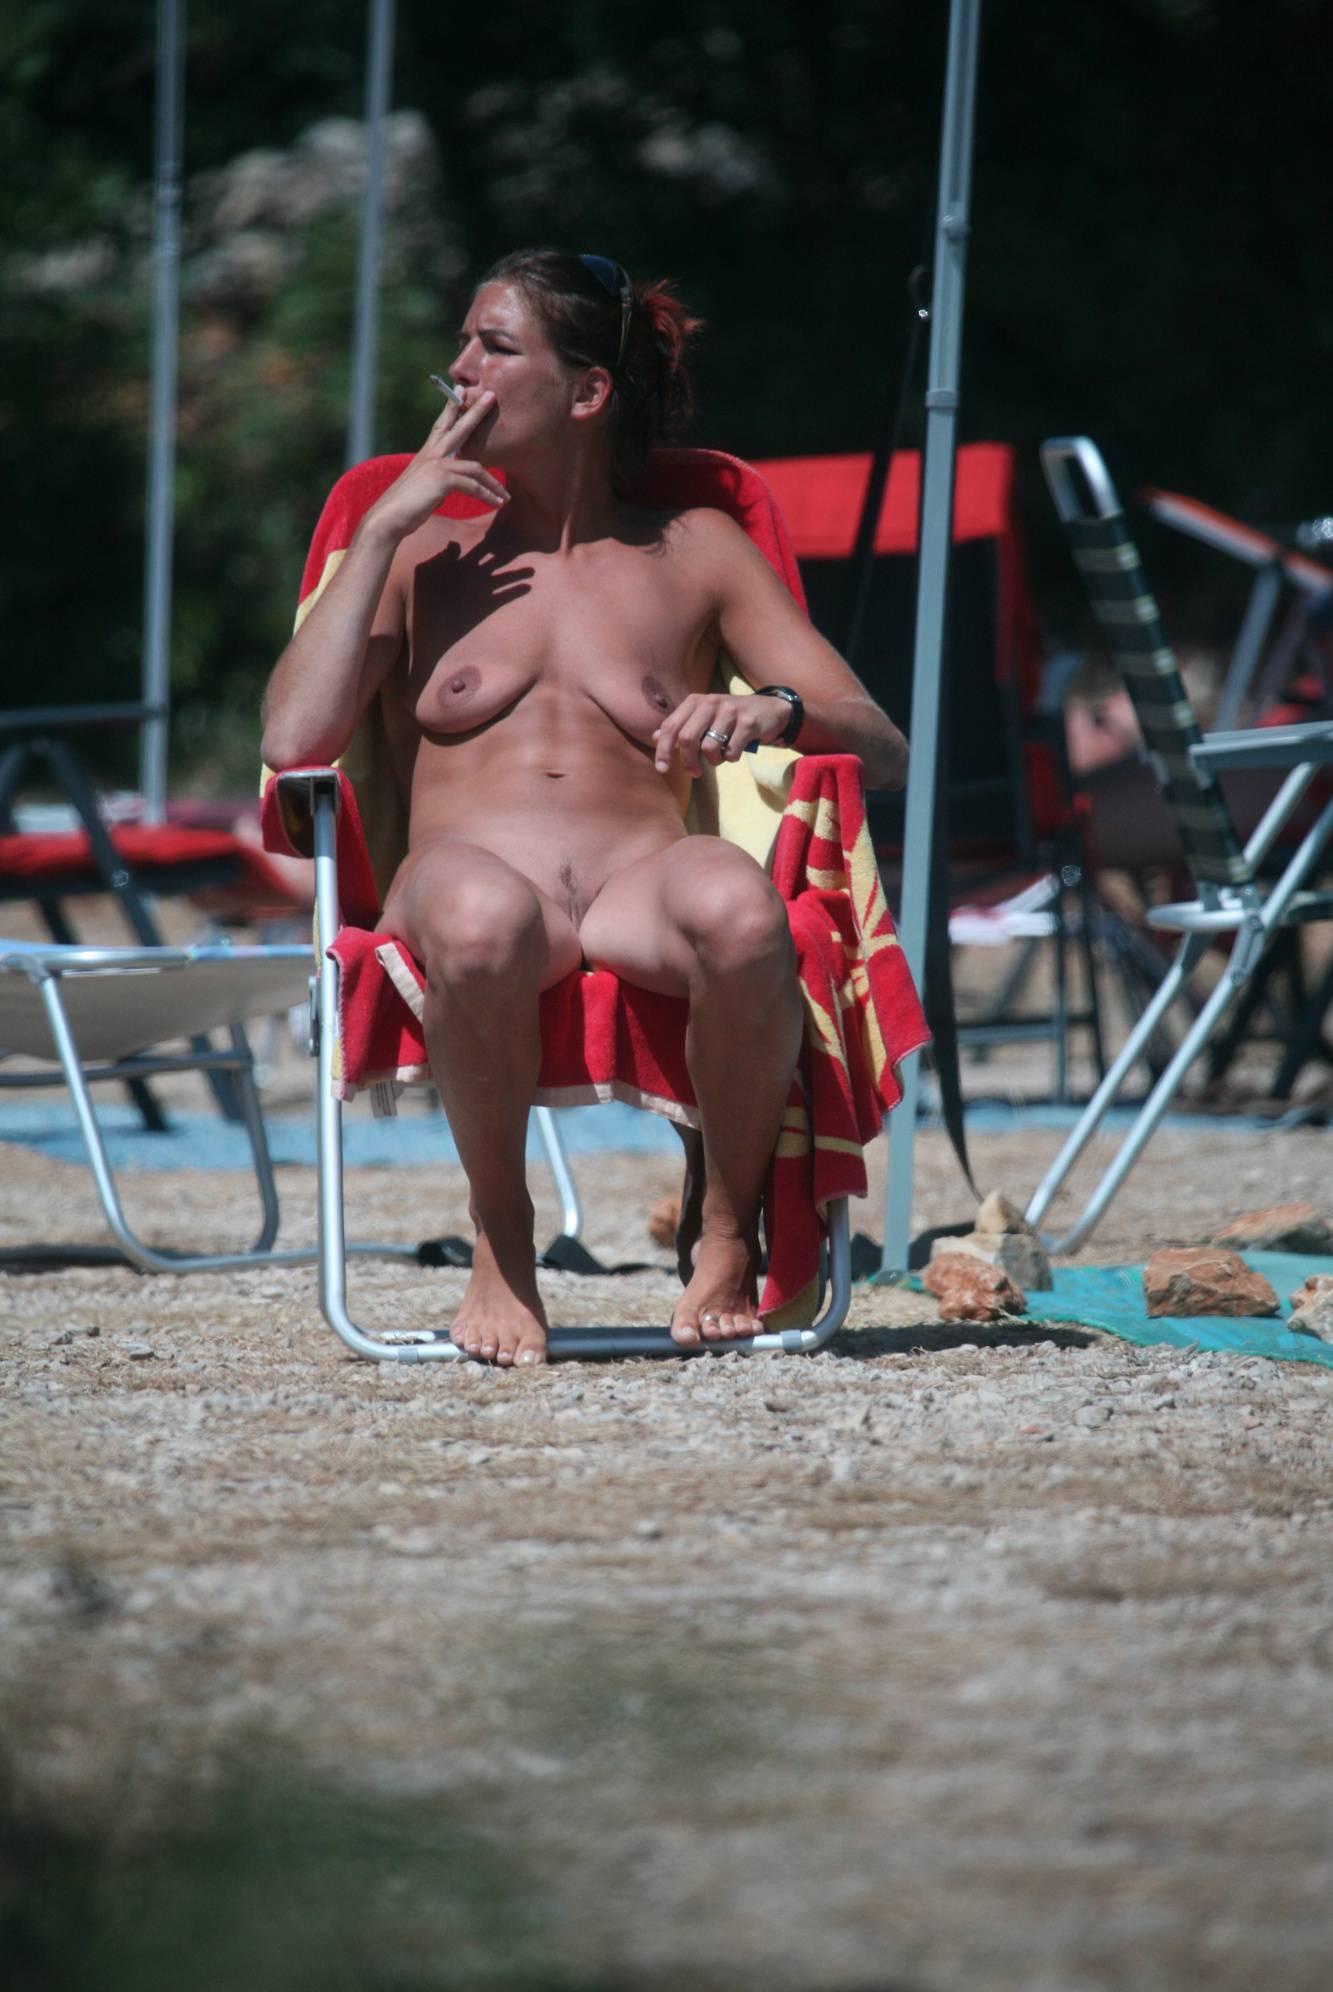 Nudist Pics Bares Nude Camping Area - 2